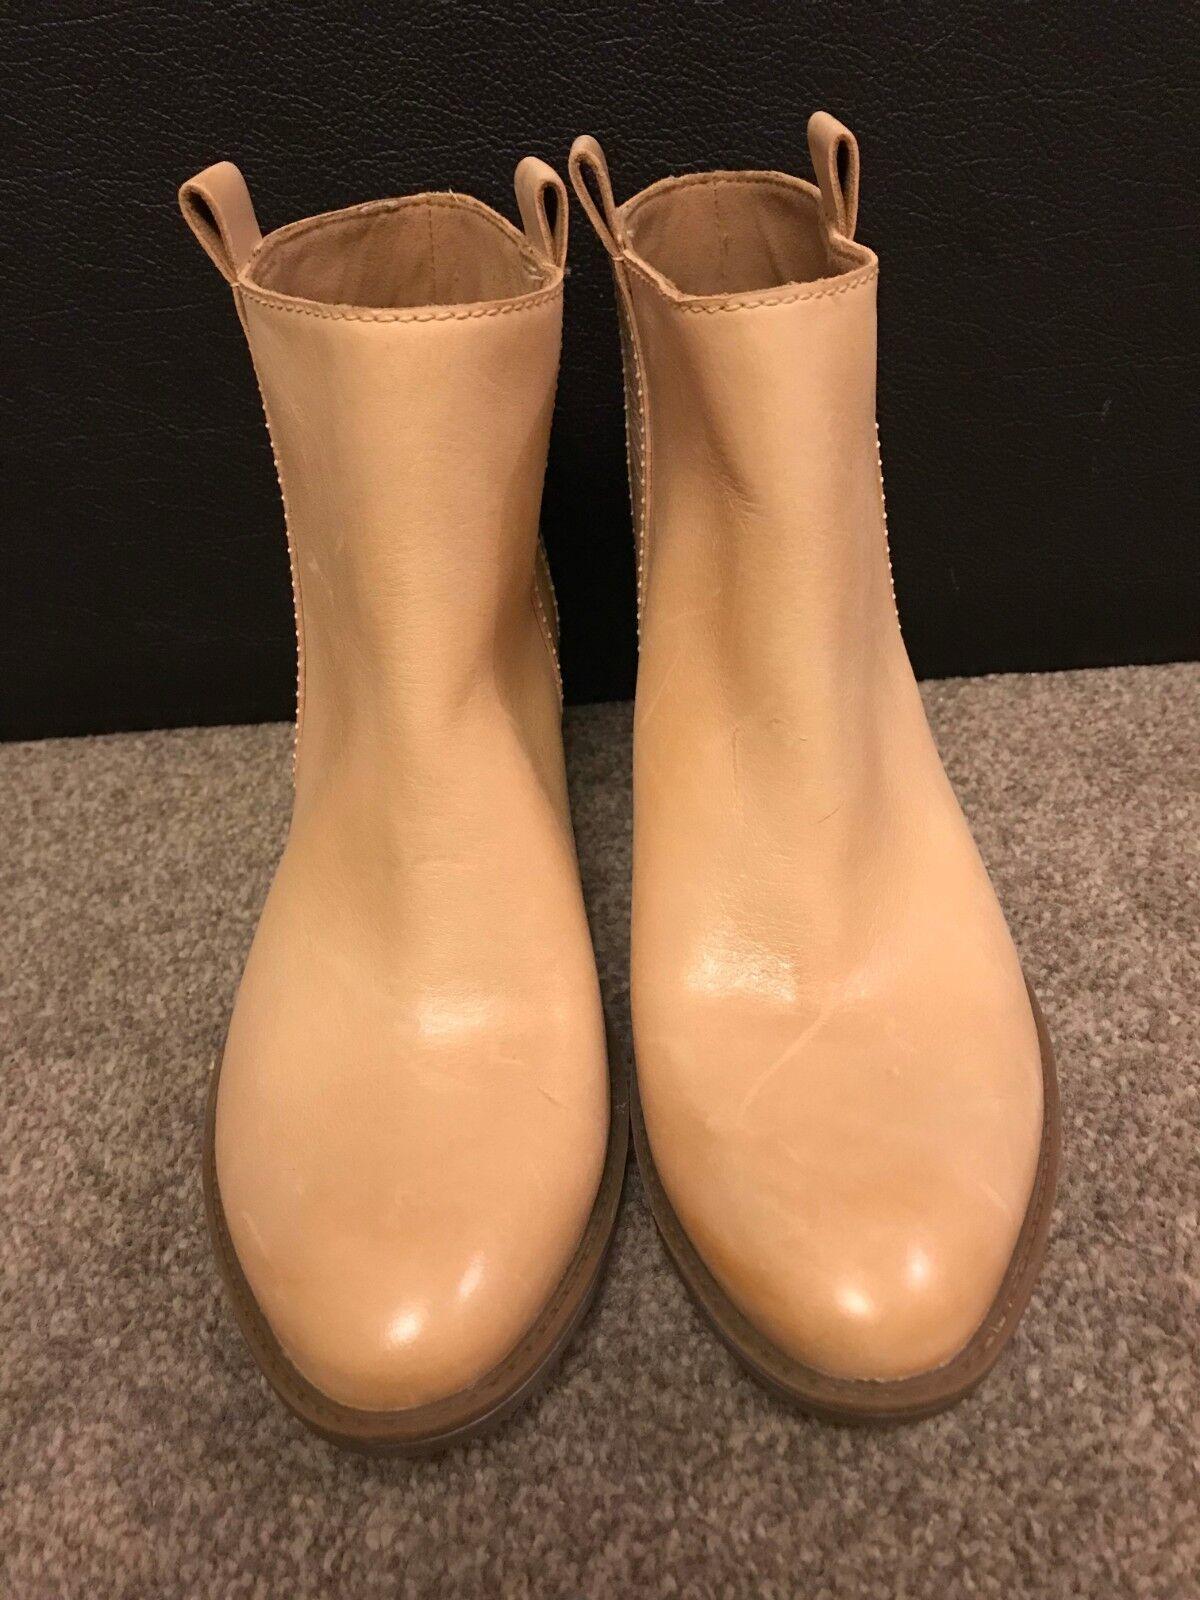 Clarks Ex-display crème beige nude bottes femmes chaussures femmes taille 5 (38)